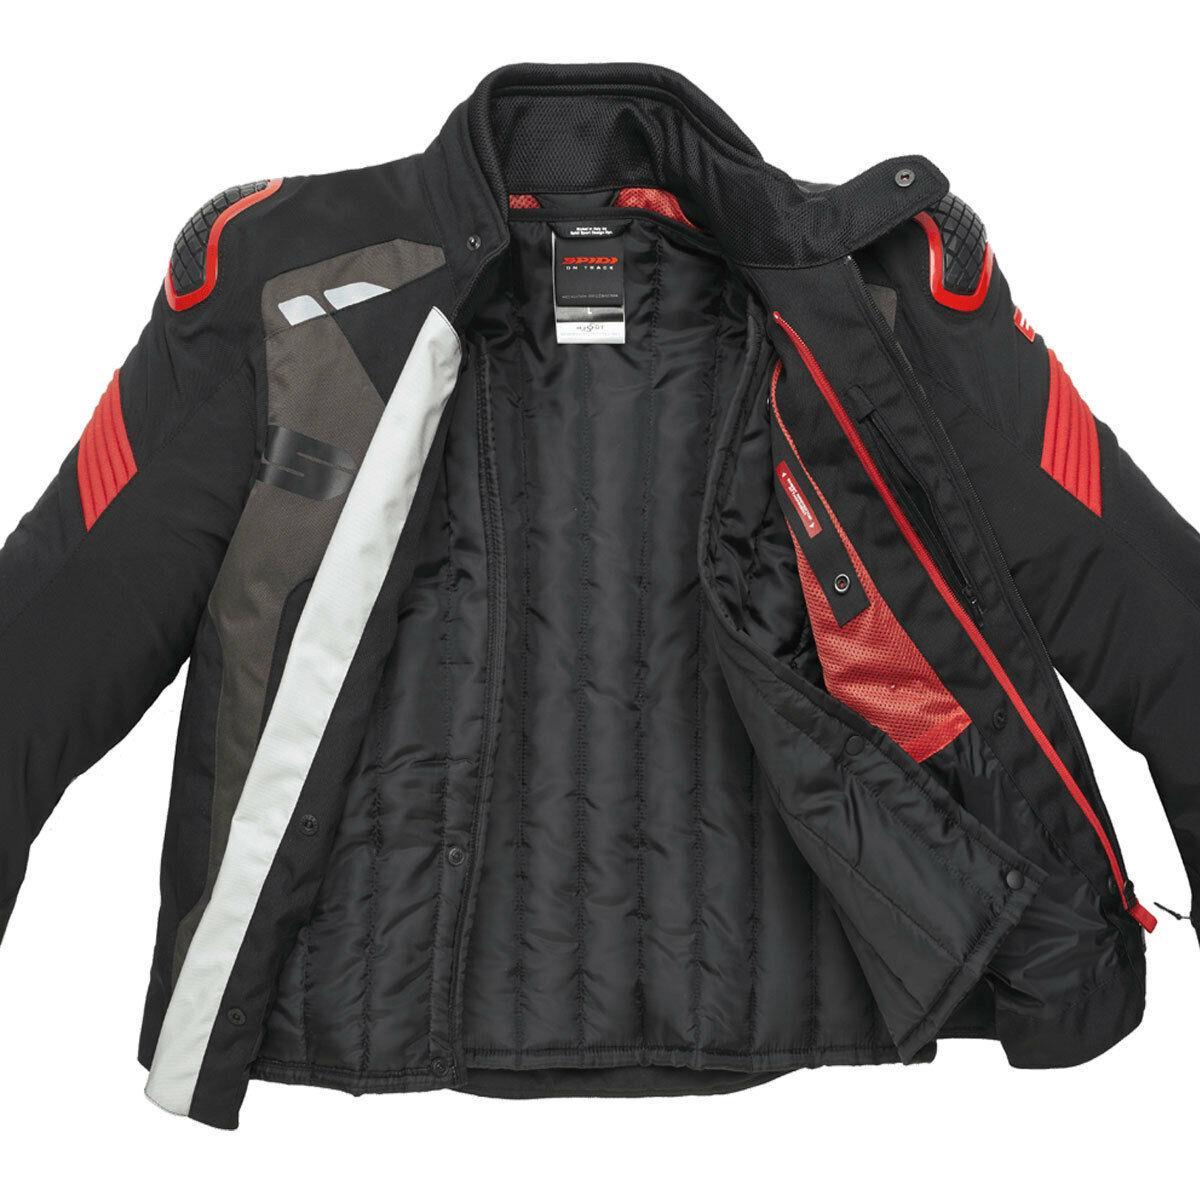 Spidi-H2Out-Warrior-Sports-Motorcycle-Motorbike-CE-Certified-Men-039-s-Jacket miniature 5